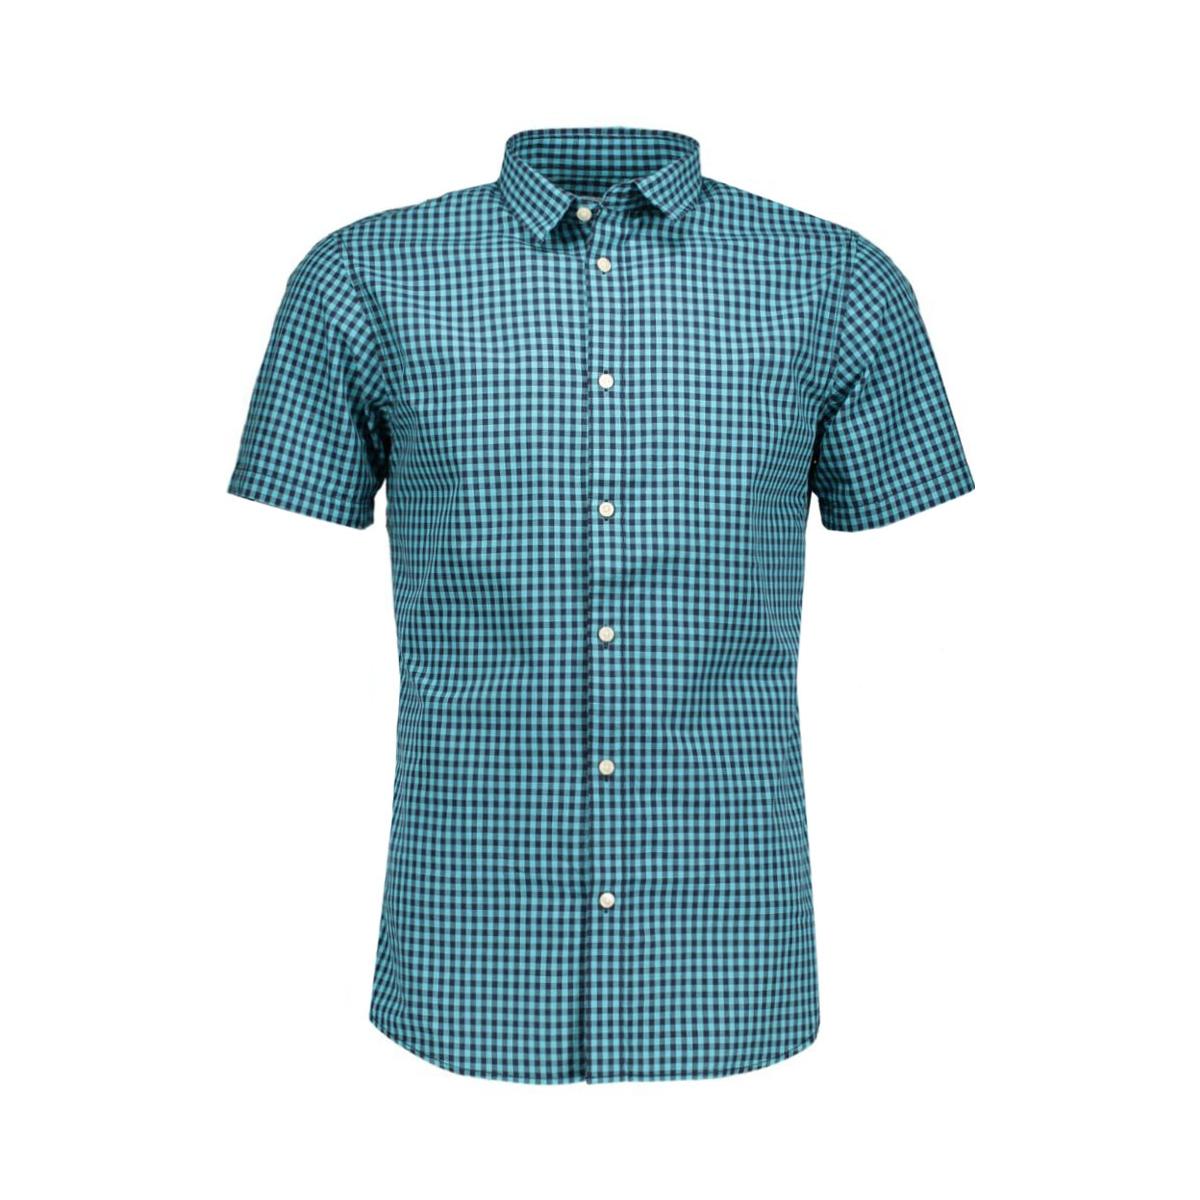 jcotim shirt no pocket 12106240 jack & jones overhemd deep teal